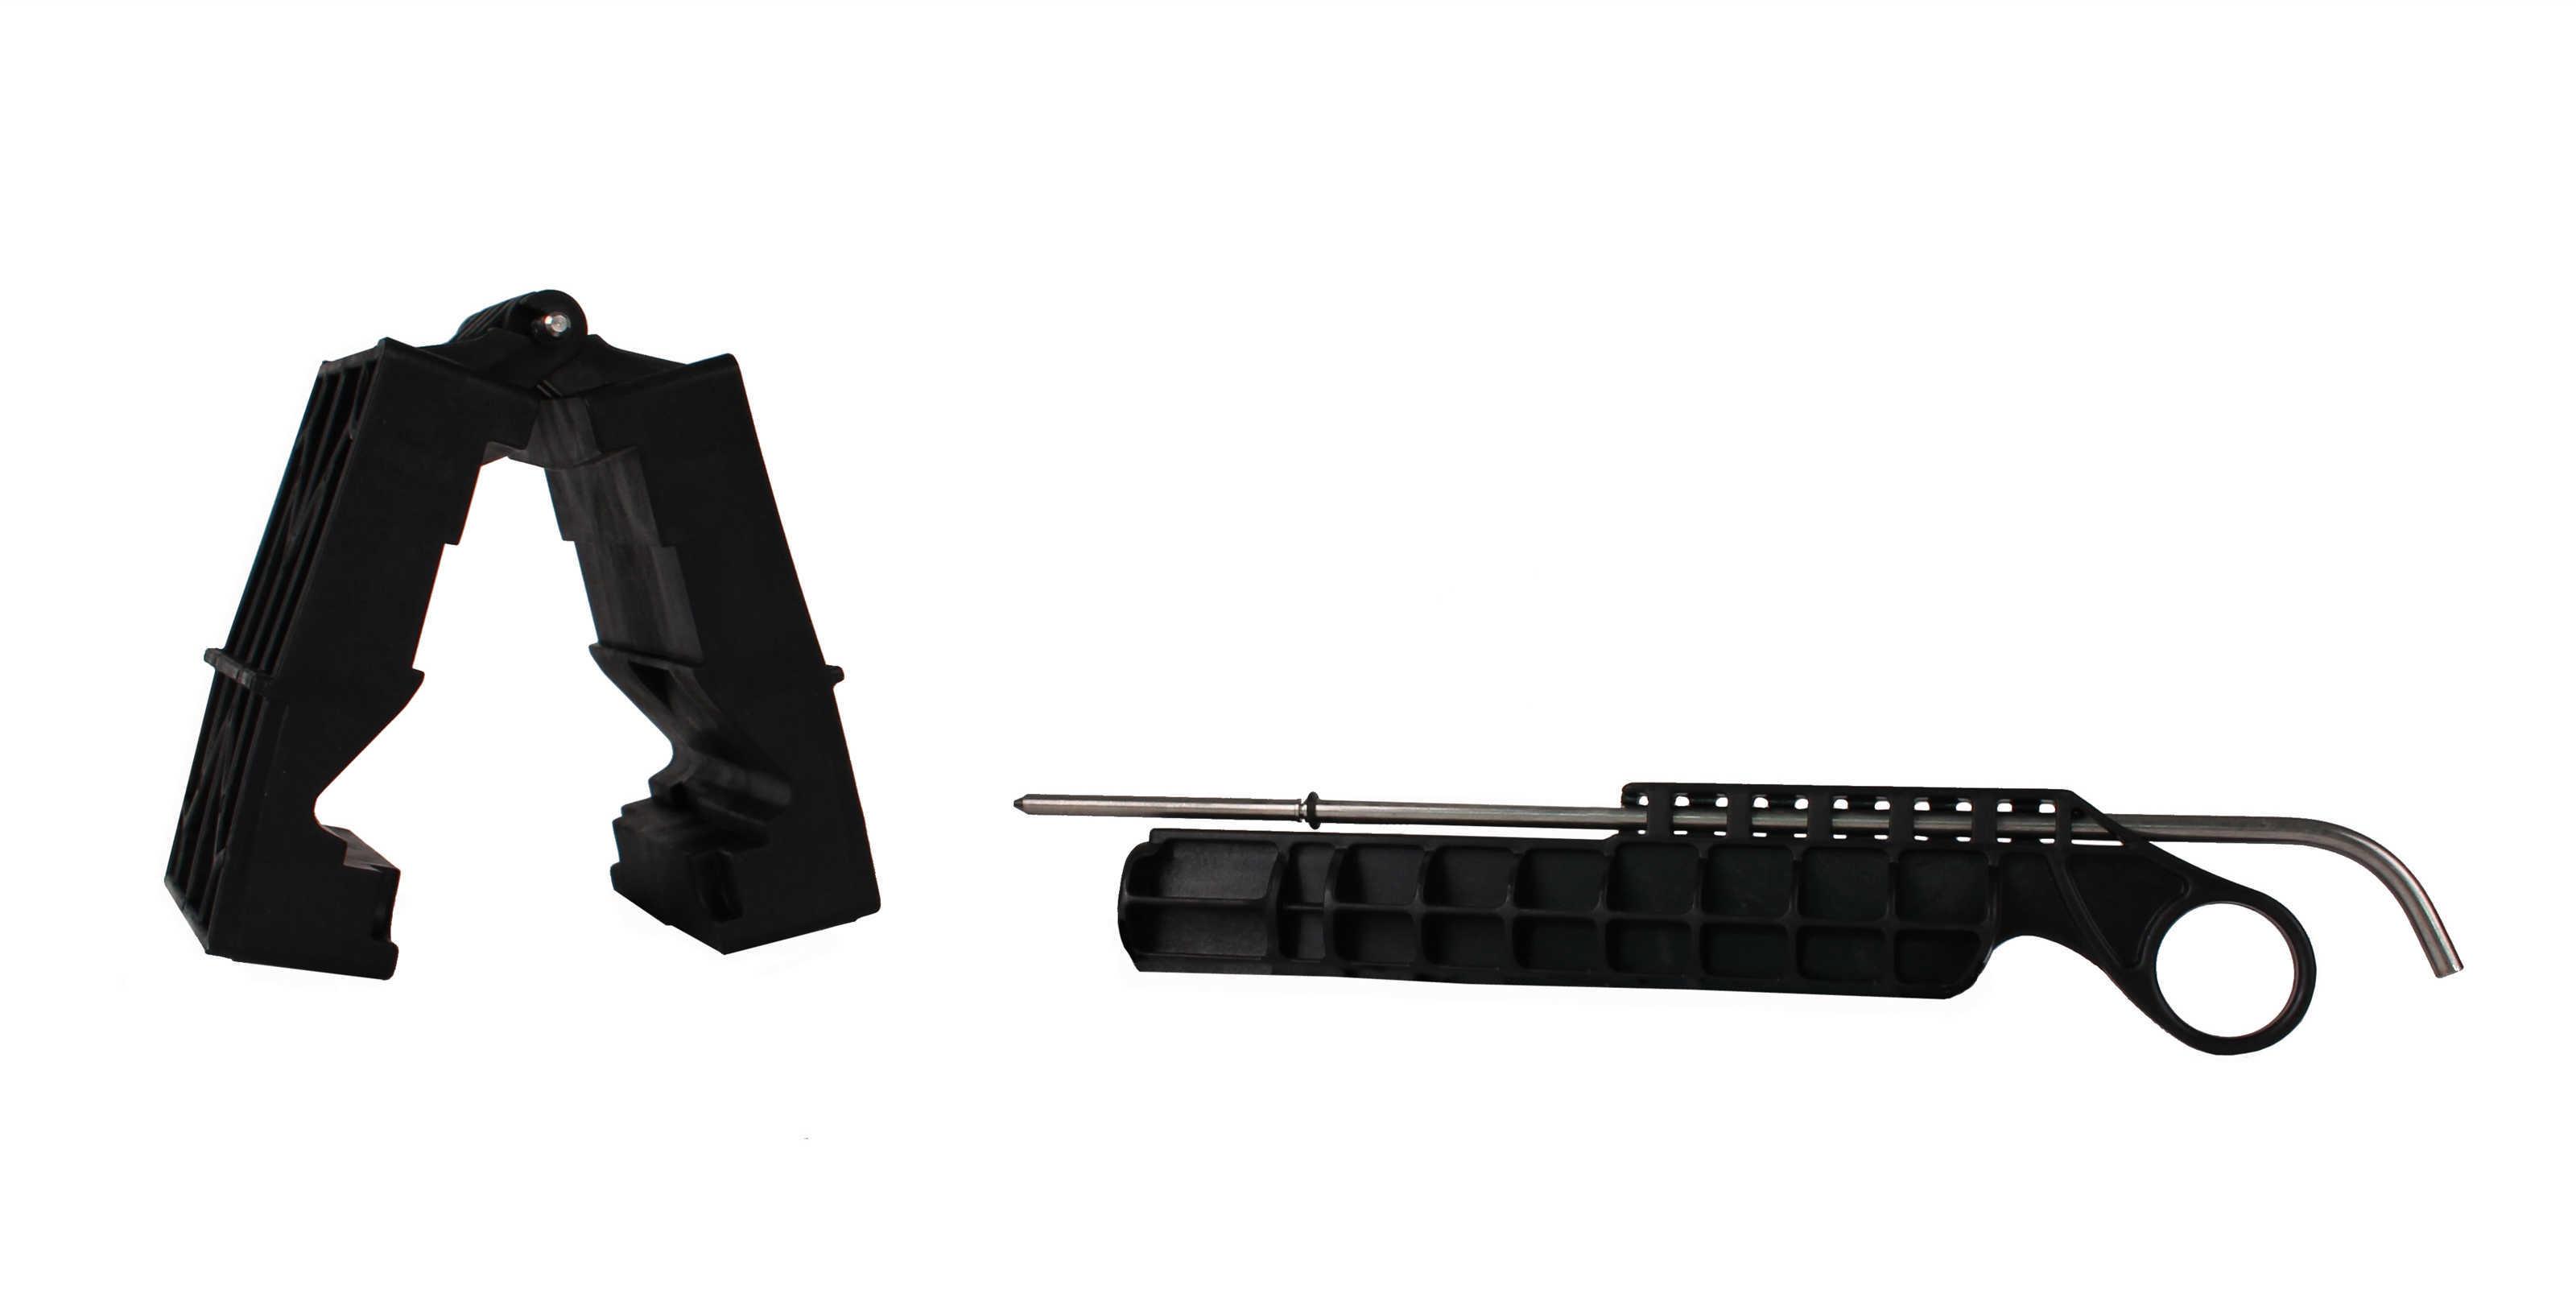 Wheeler Delta Series AR15 Upper Vise Block Clamp